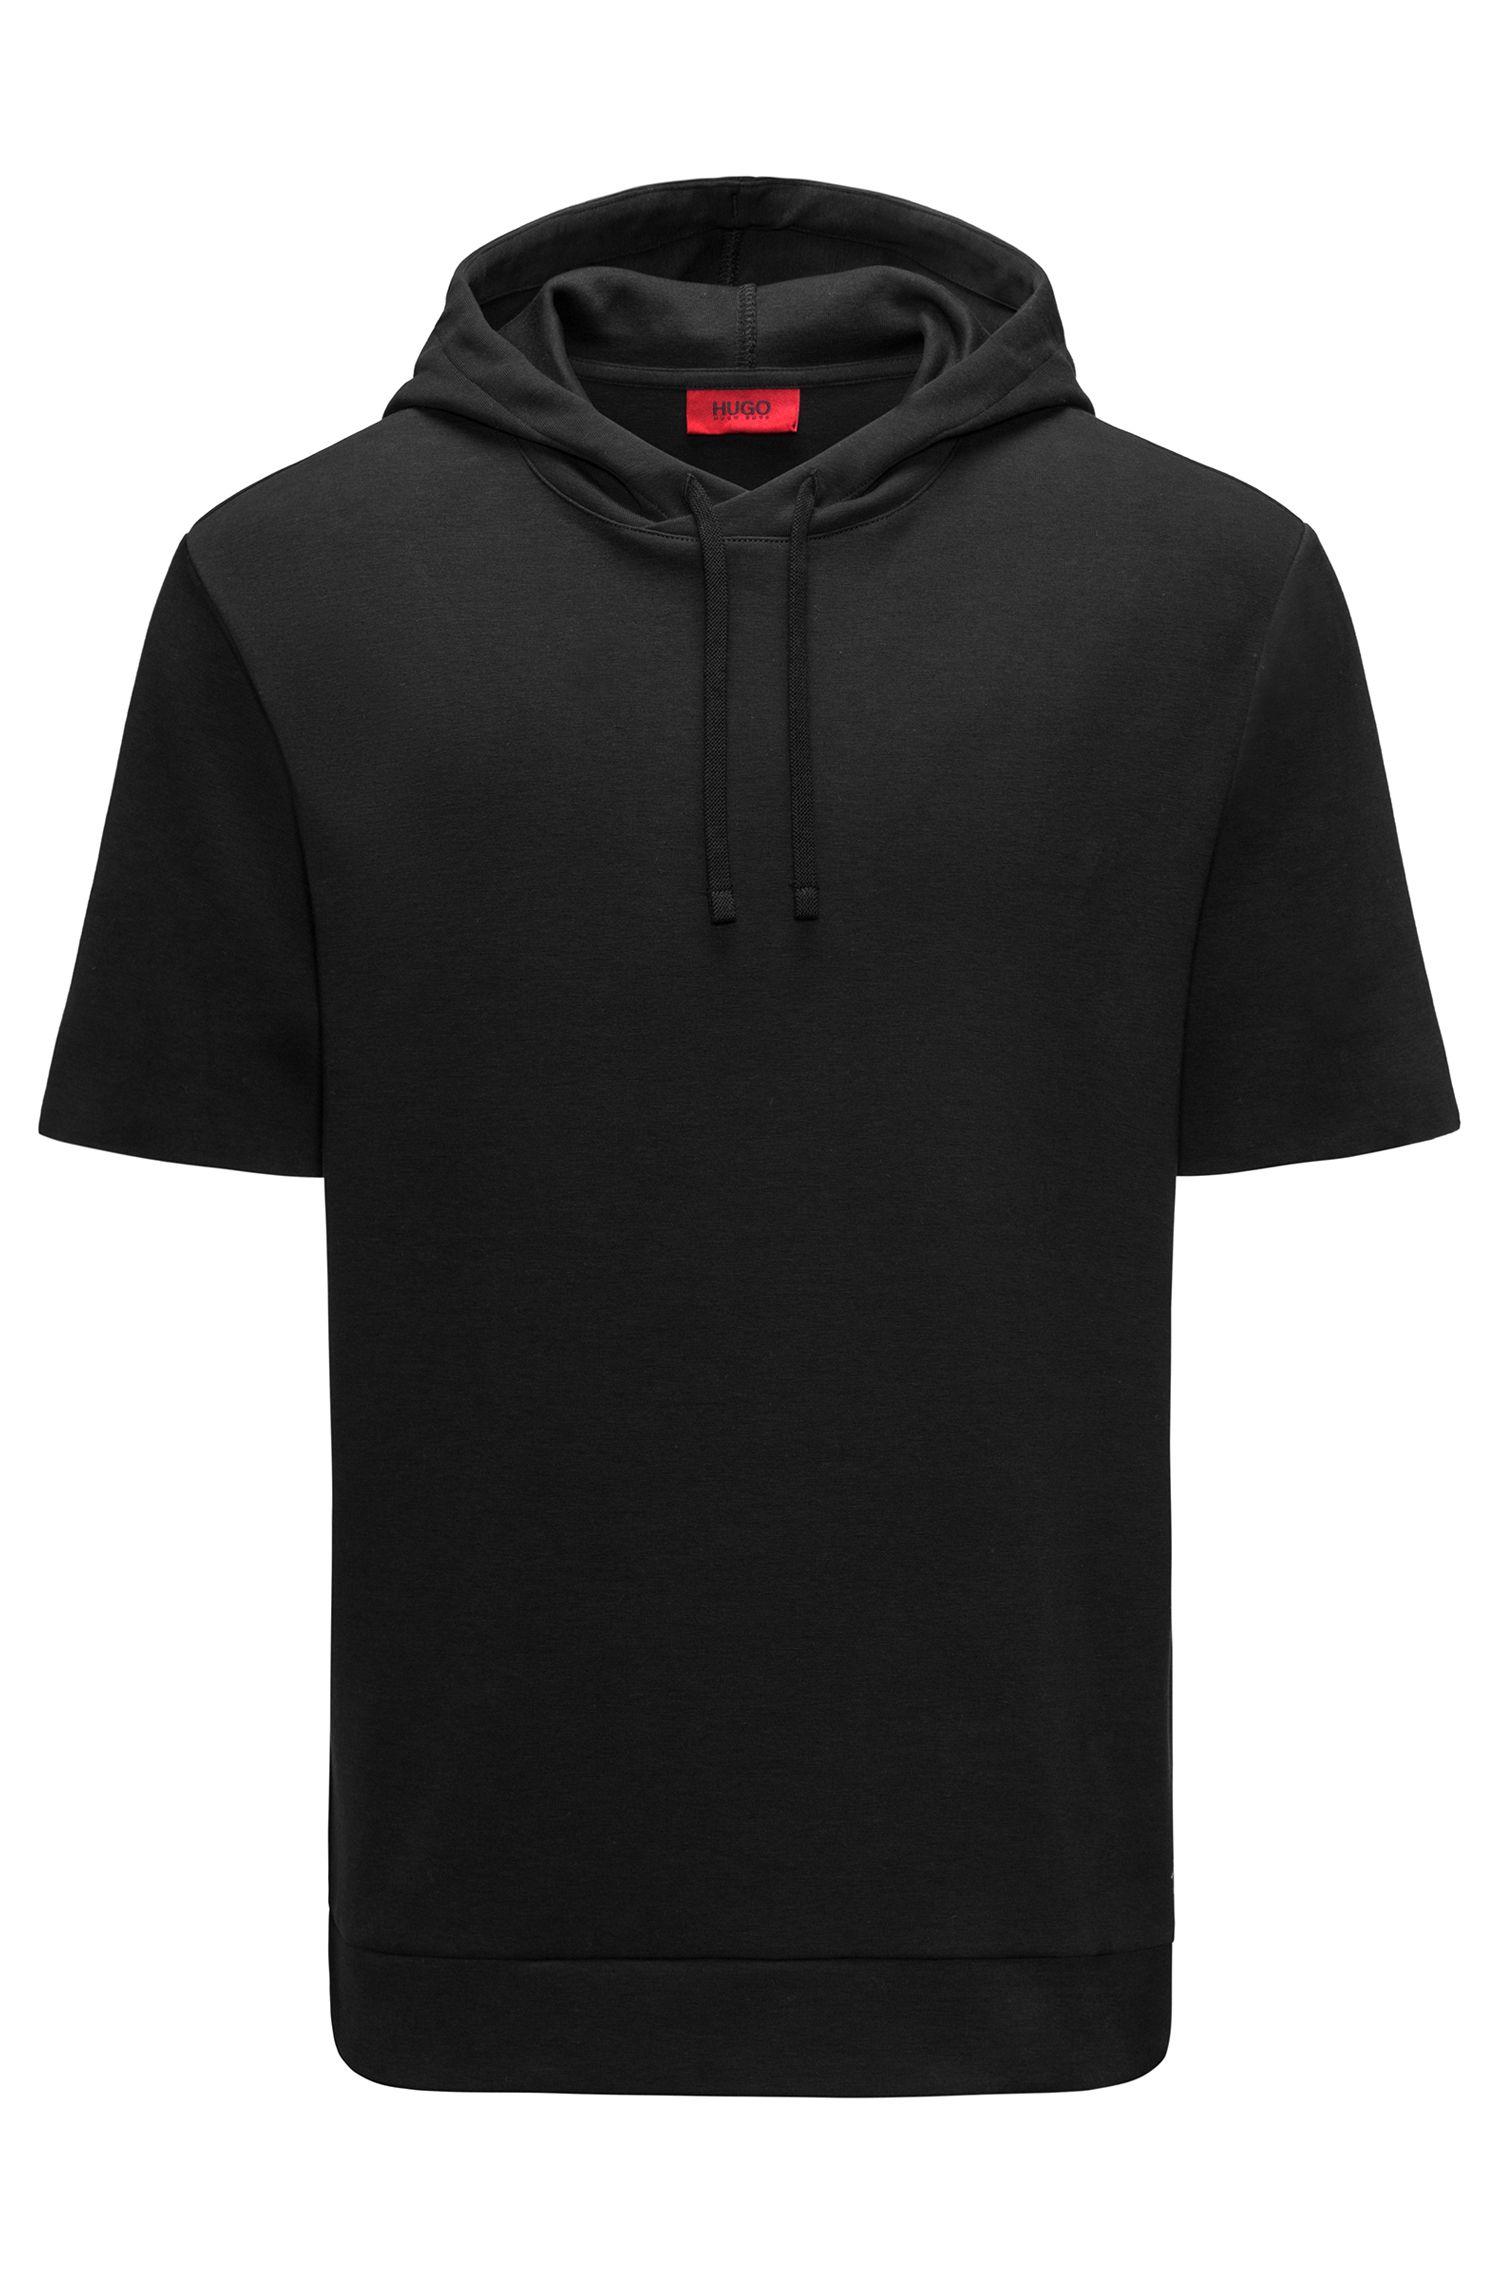 Short-sleeved hooded sweatshirt in an interlock cotton blend